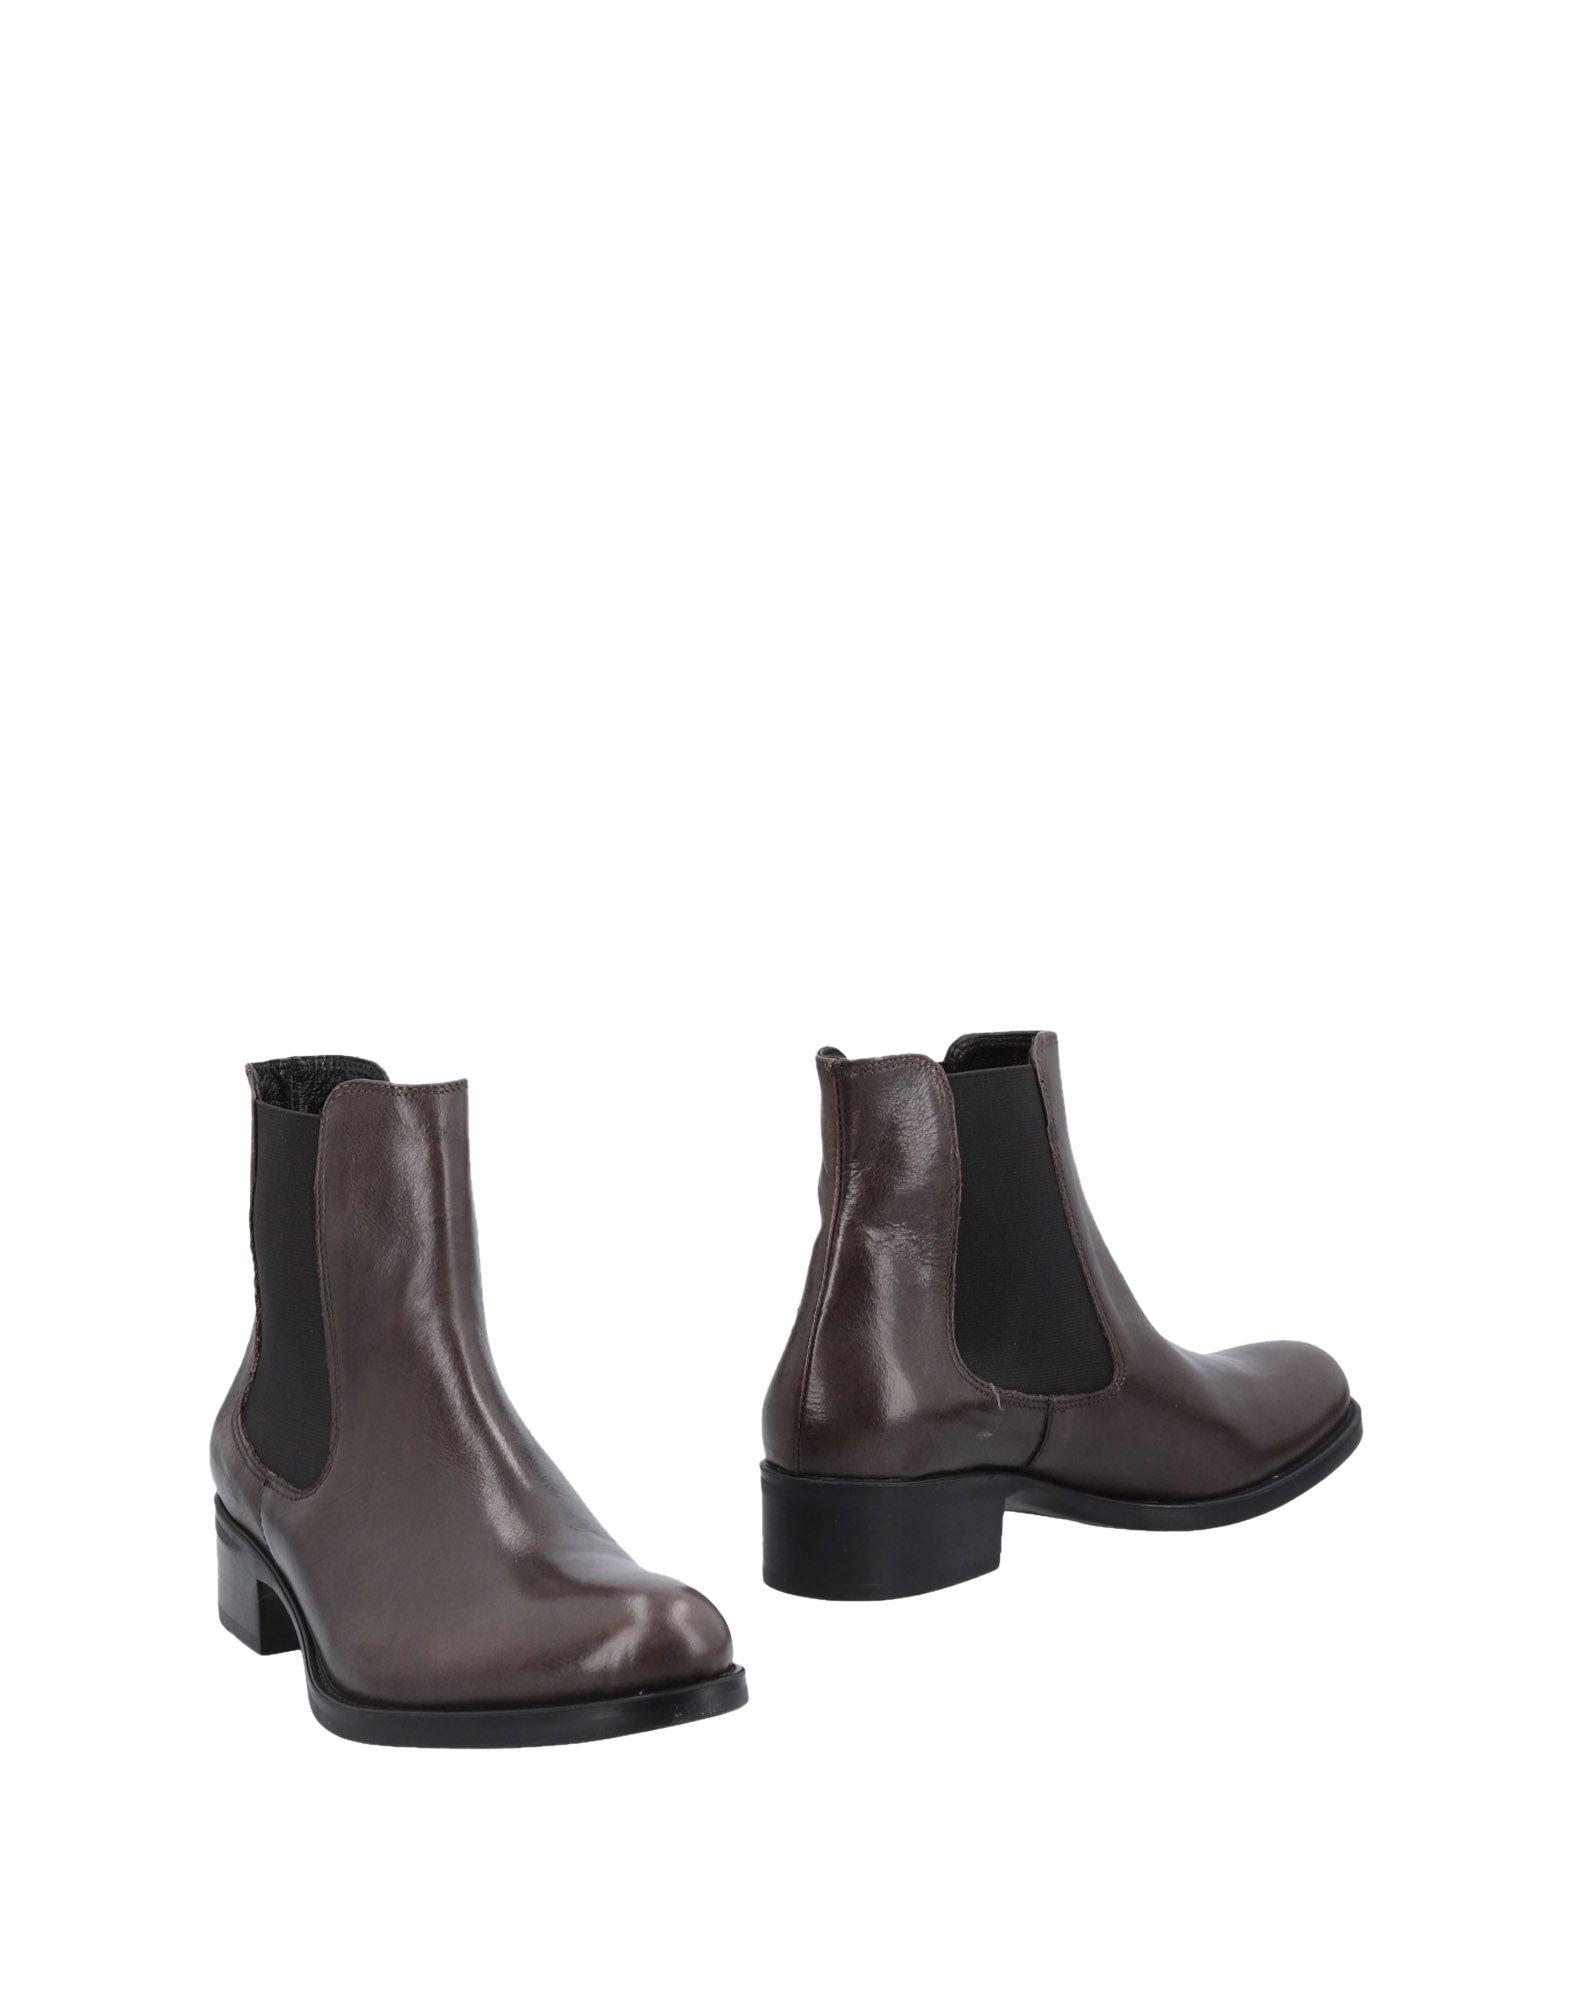 Gut tragenPaola um billige Schuhe zu tragenPaola Gut Ferri Chelsea Boots Damen  11016735WI cd6010